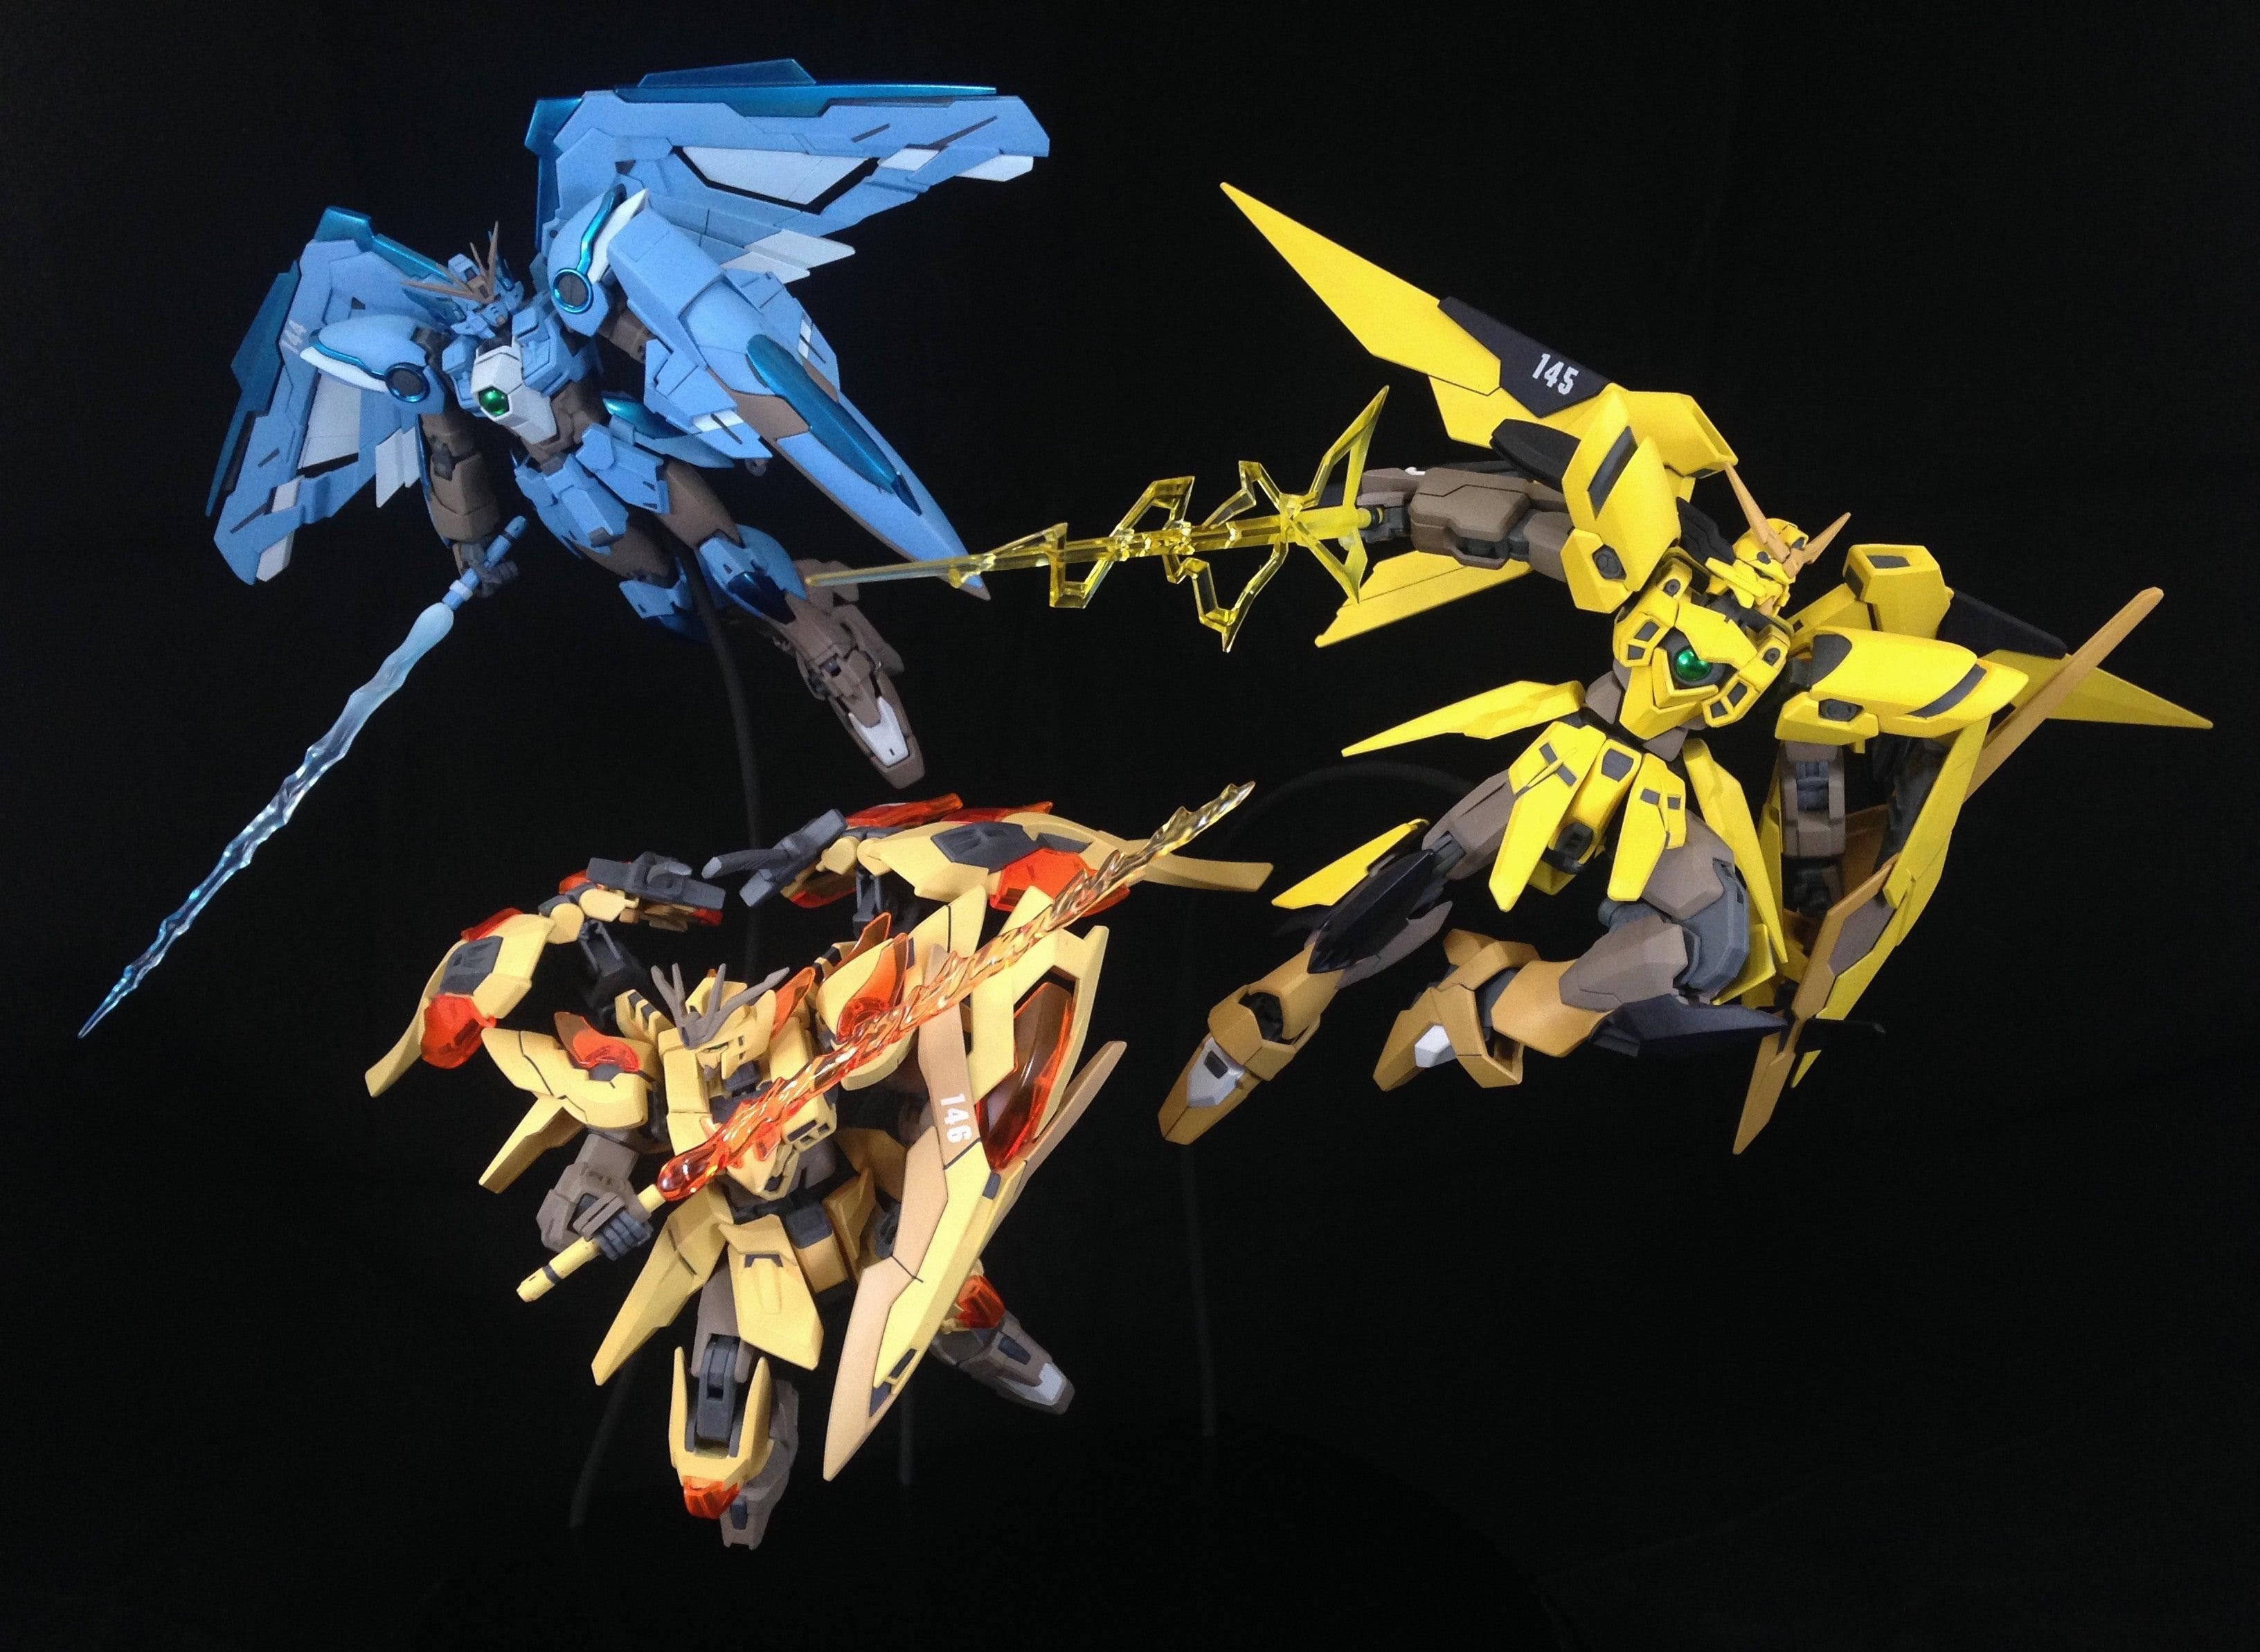 gundam kotaku-core models toys